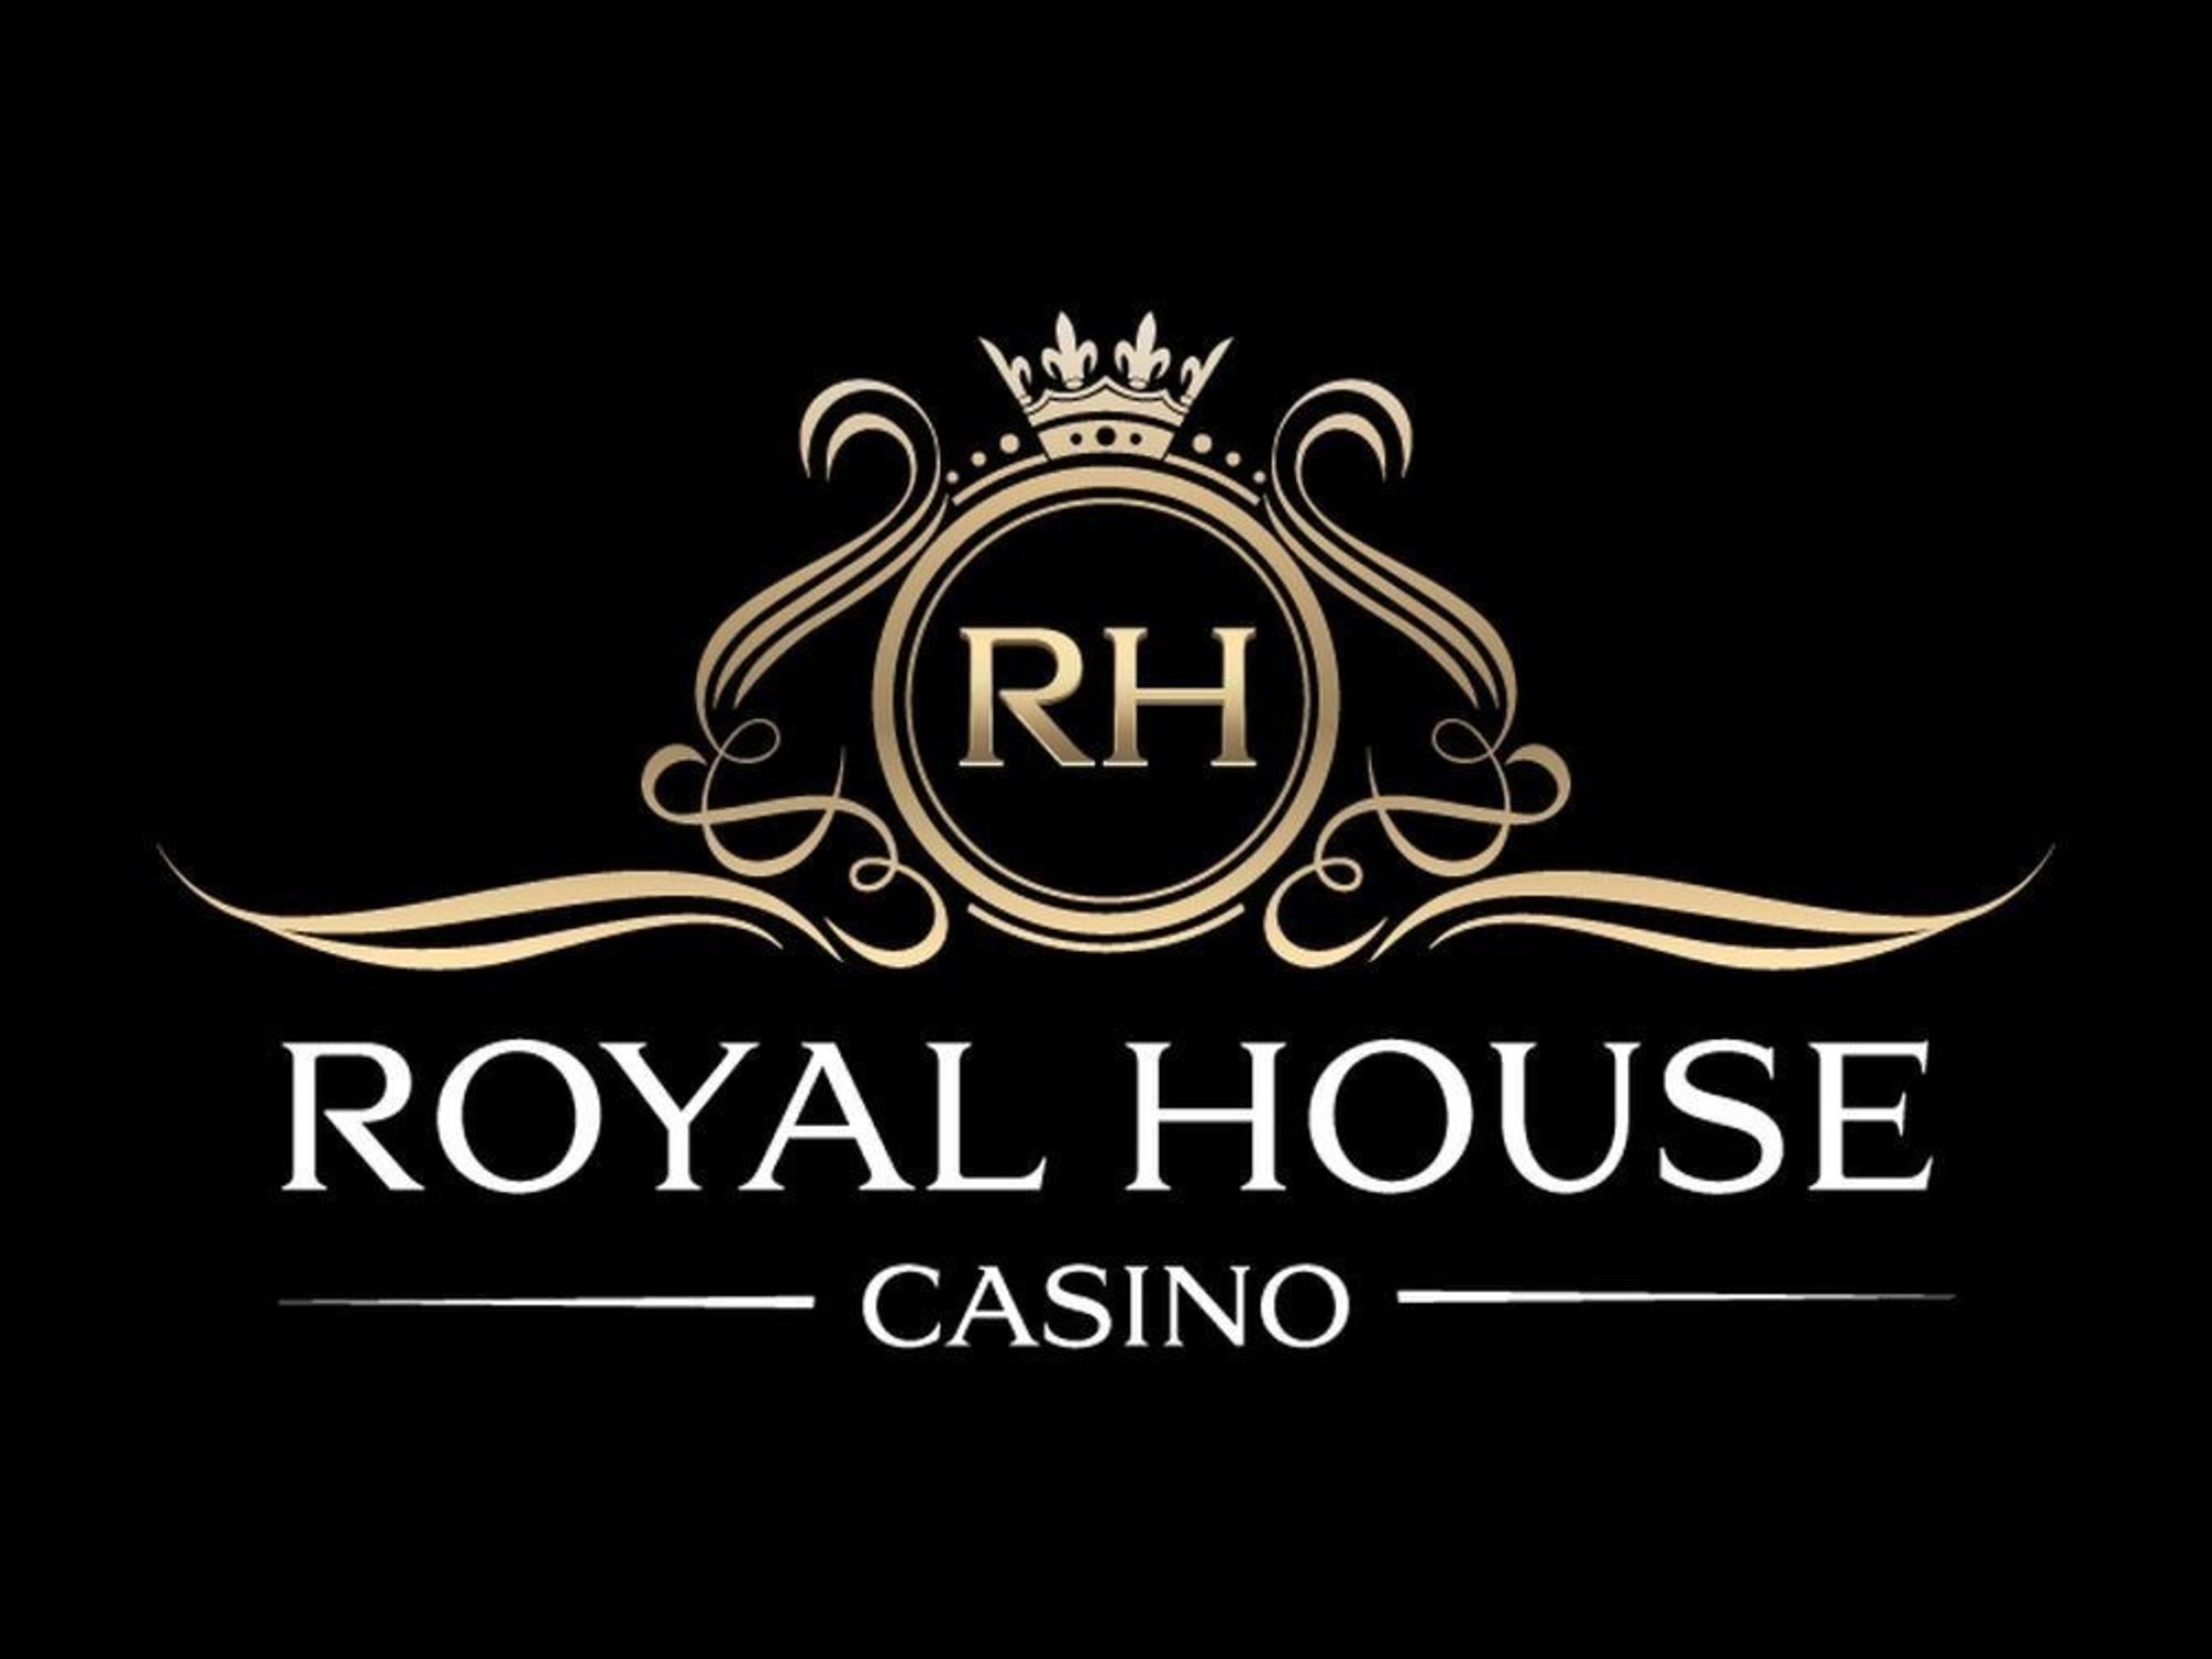 Royal House Casino Logo (PRNewsFoto/Royal House Casino)